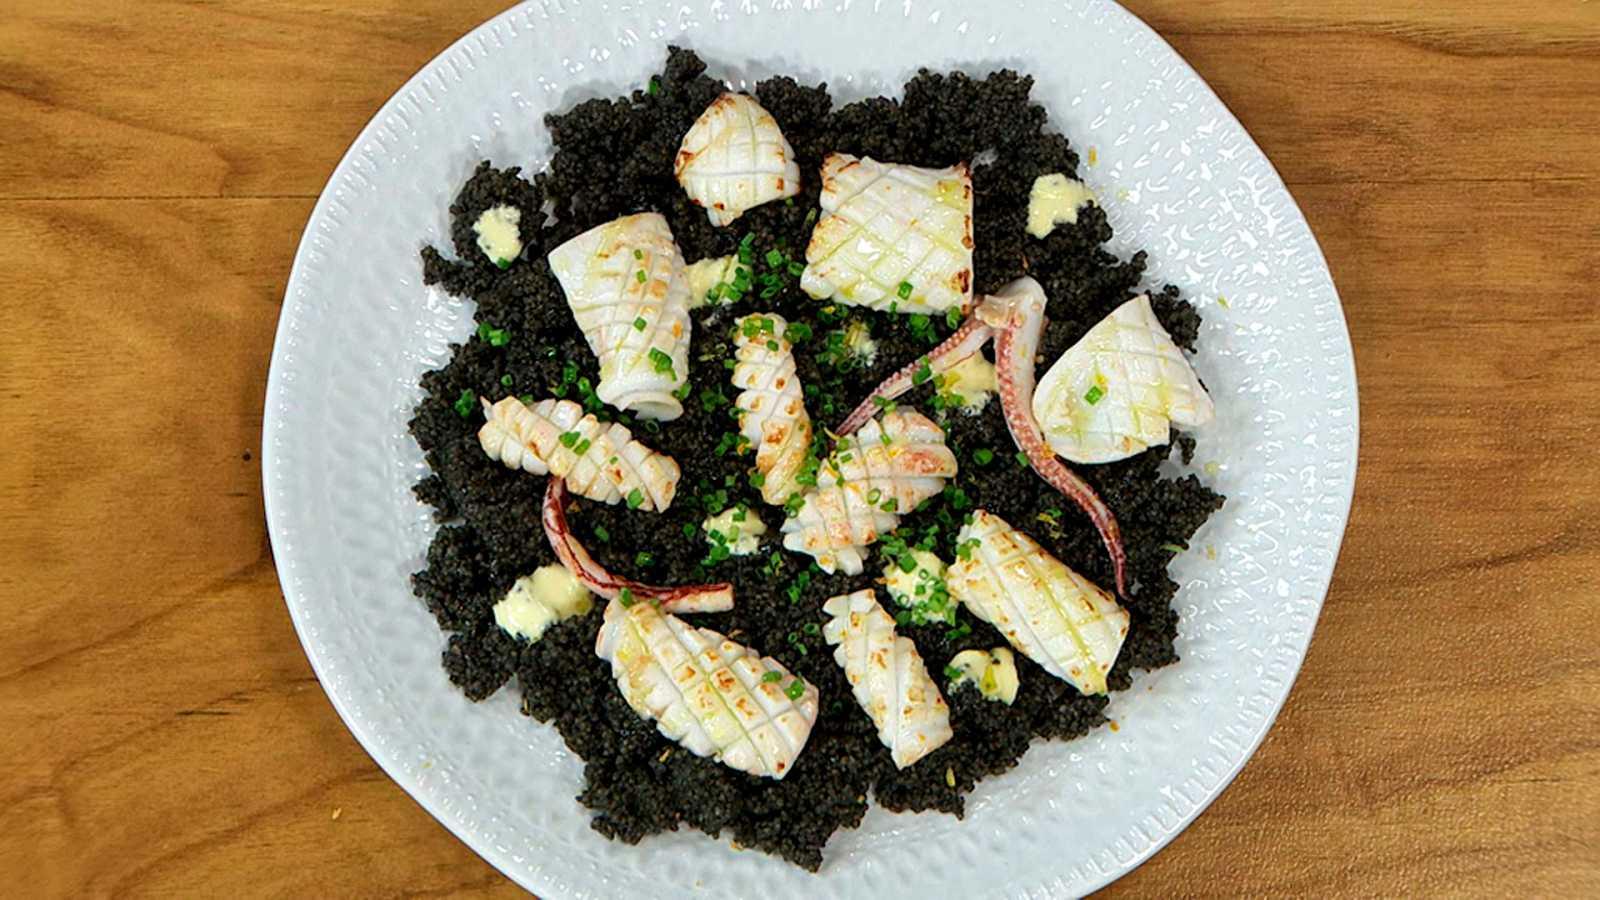 Torres en la cocina - Cuscús negro de calamar